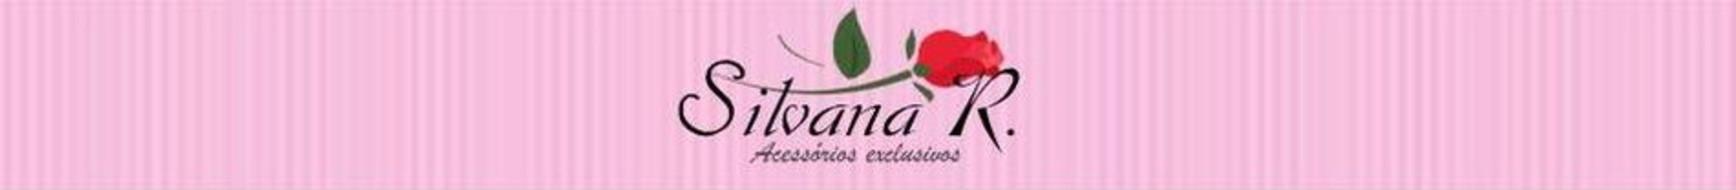 SILVANA R.